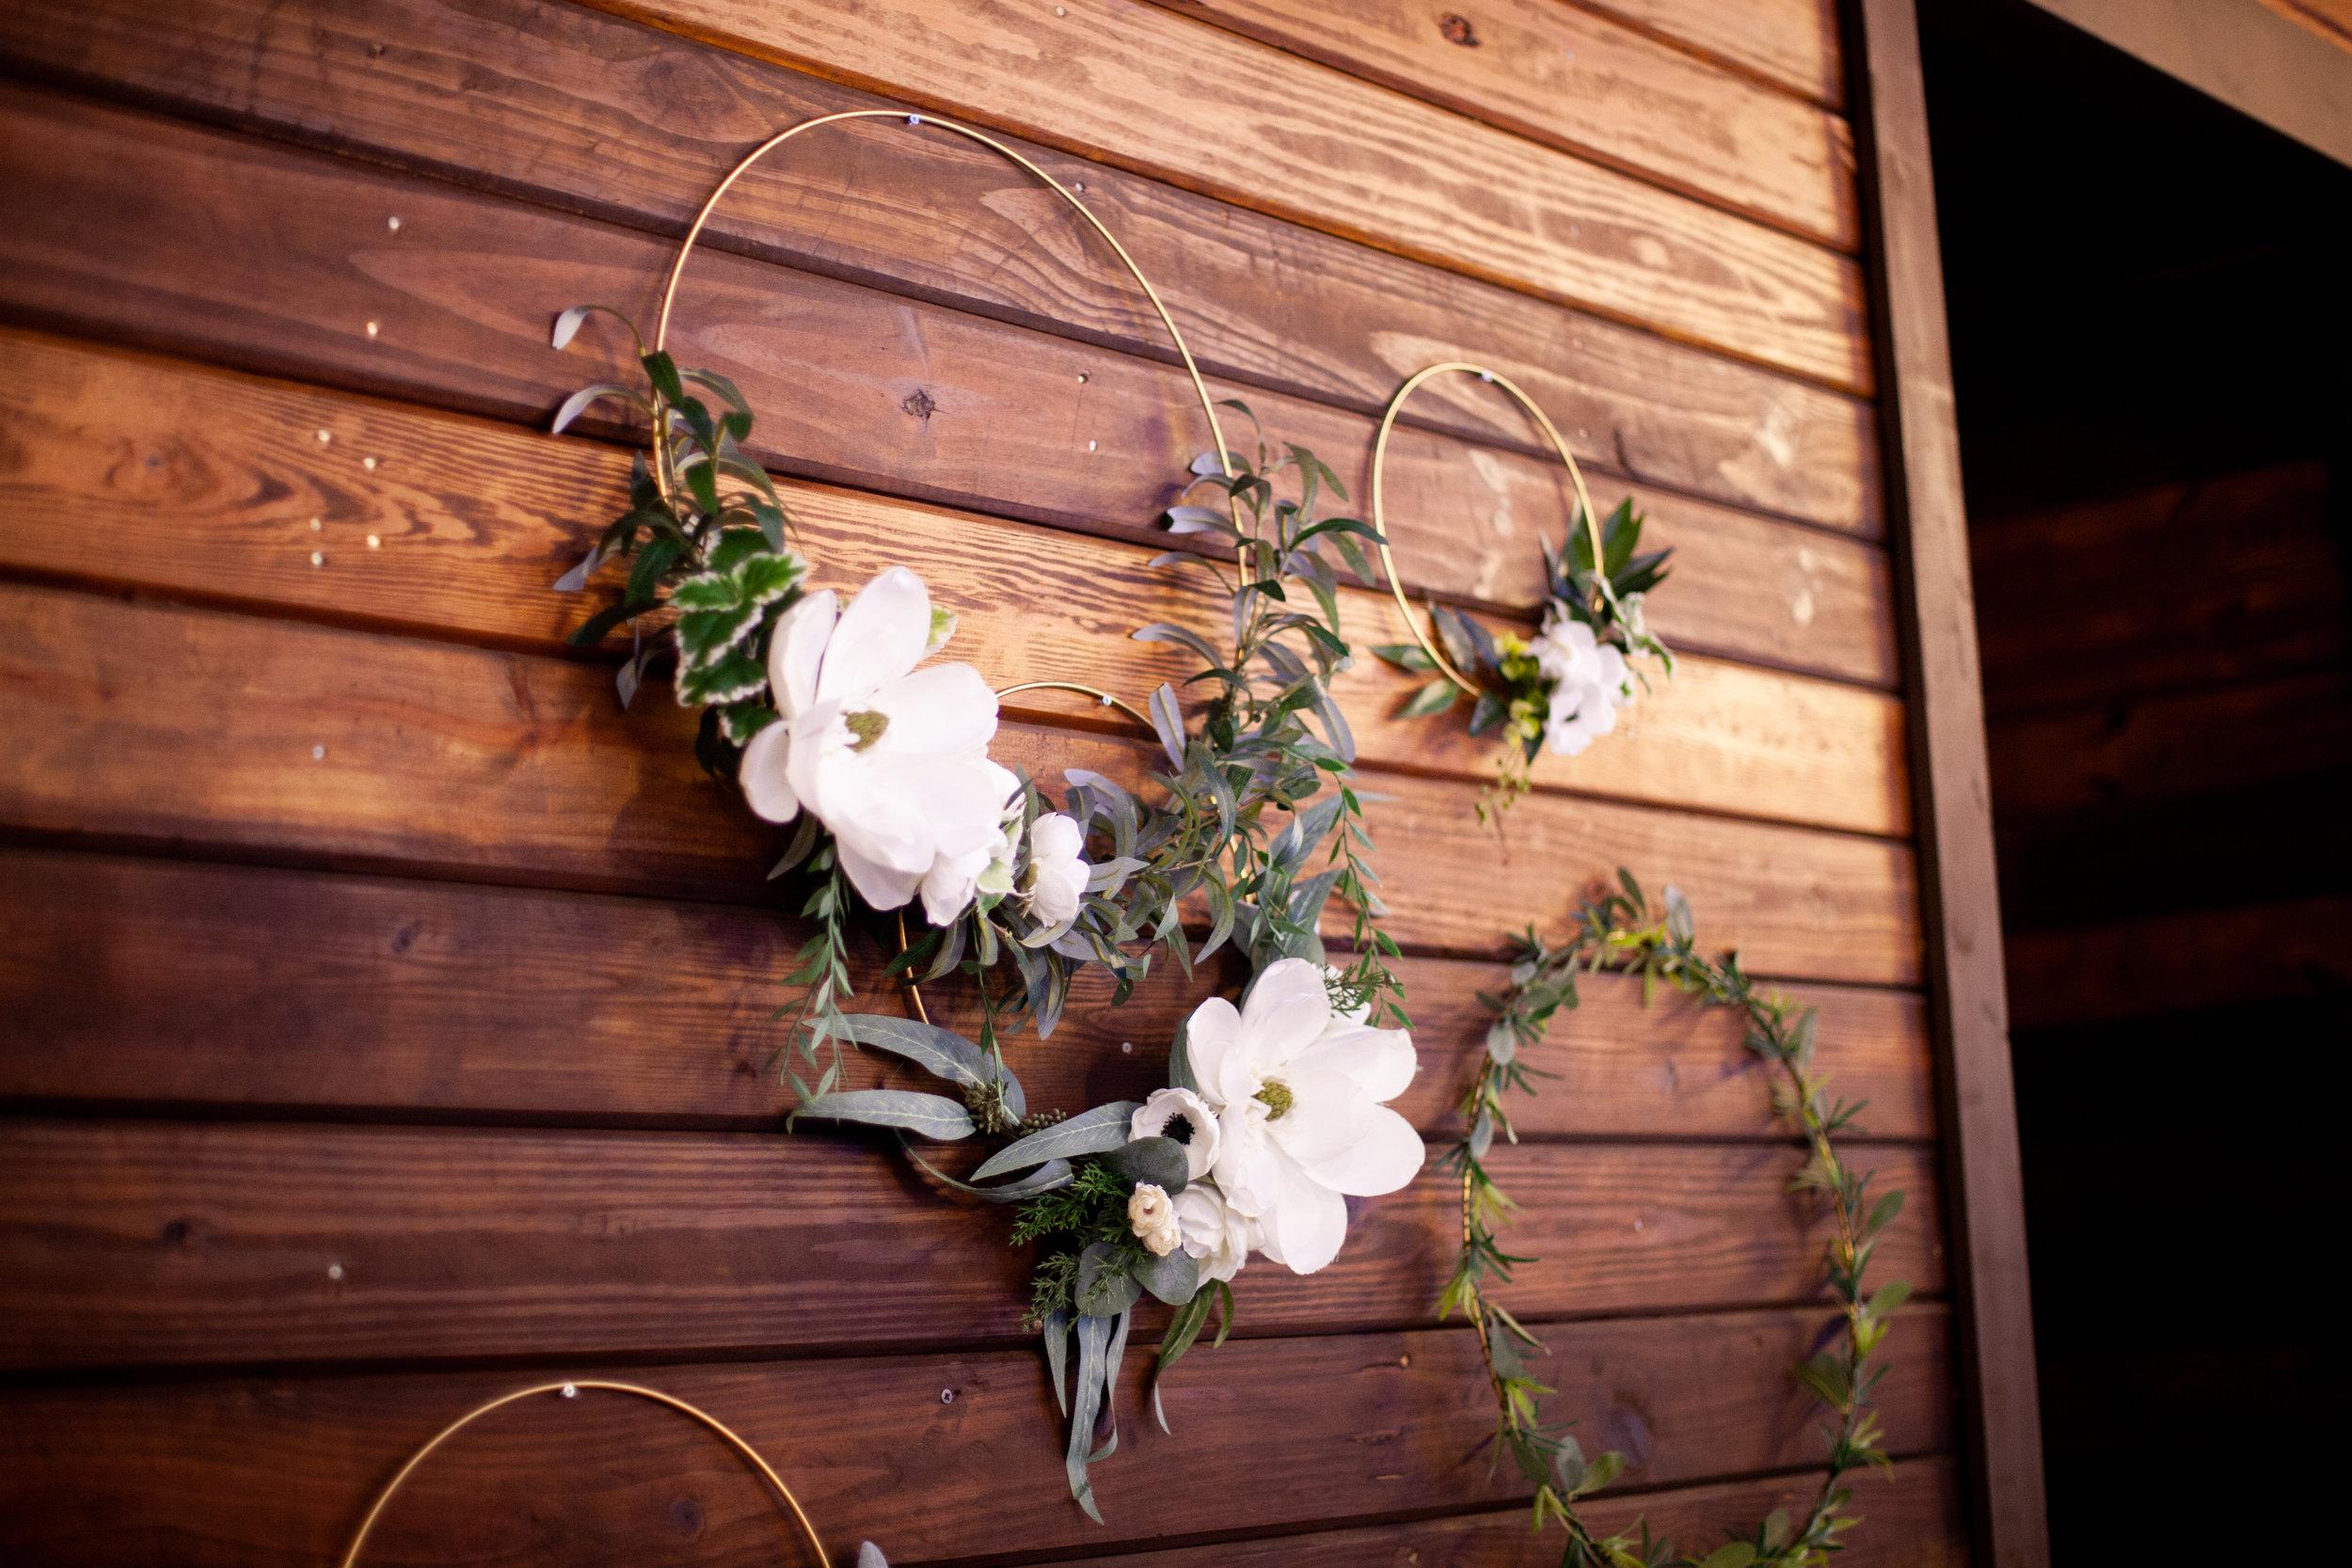 kelilina photography and films florida wedding photography videography 019-5.jpg